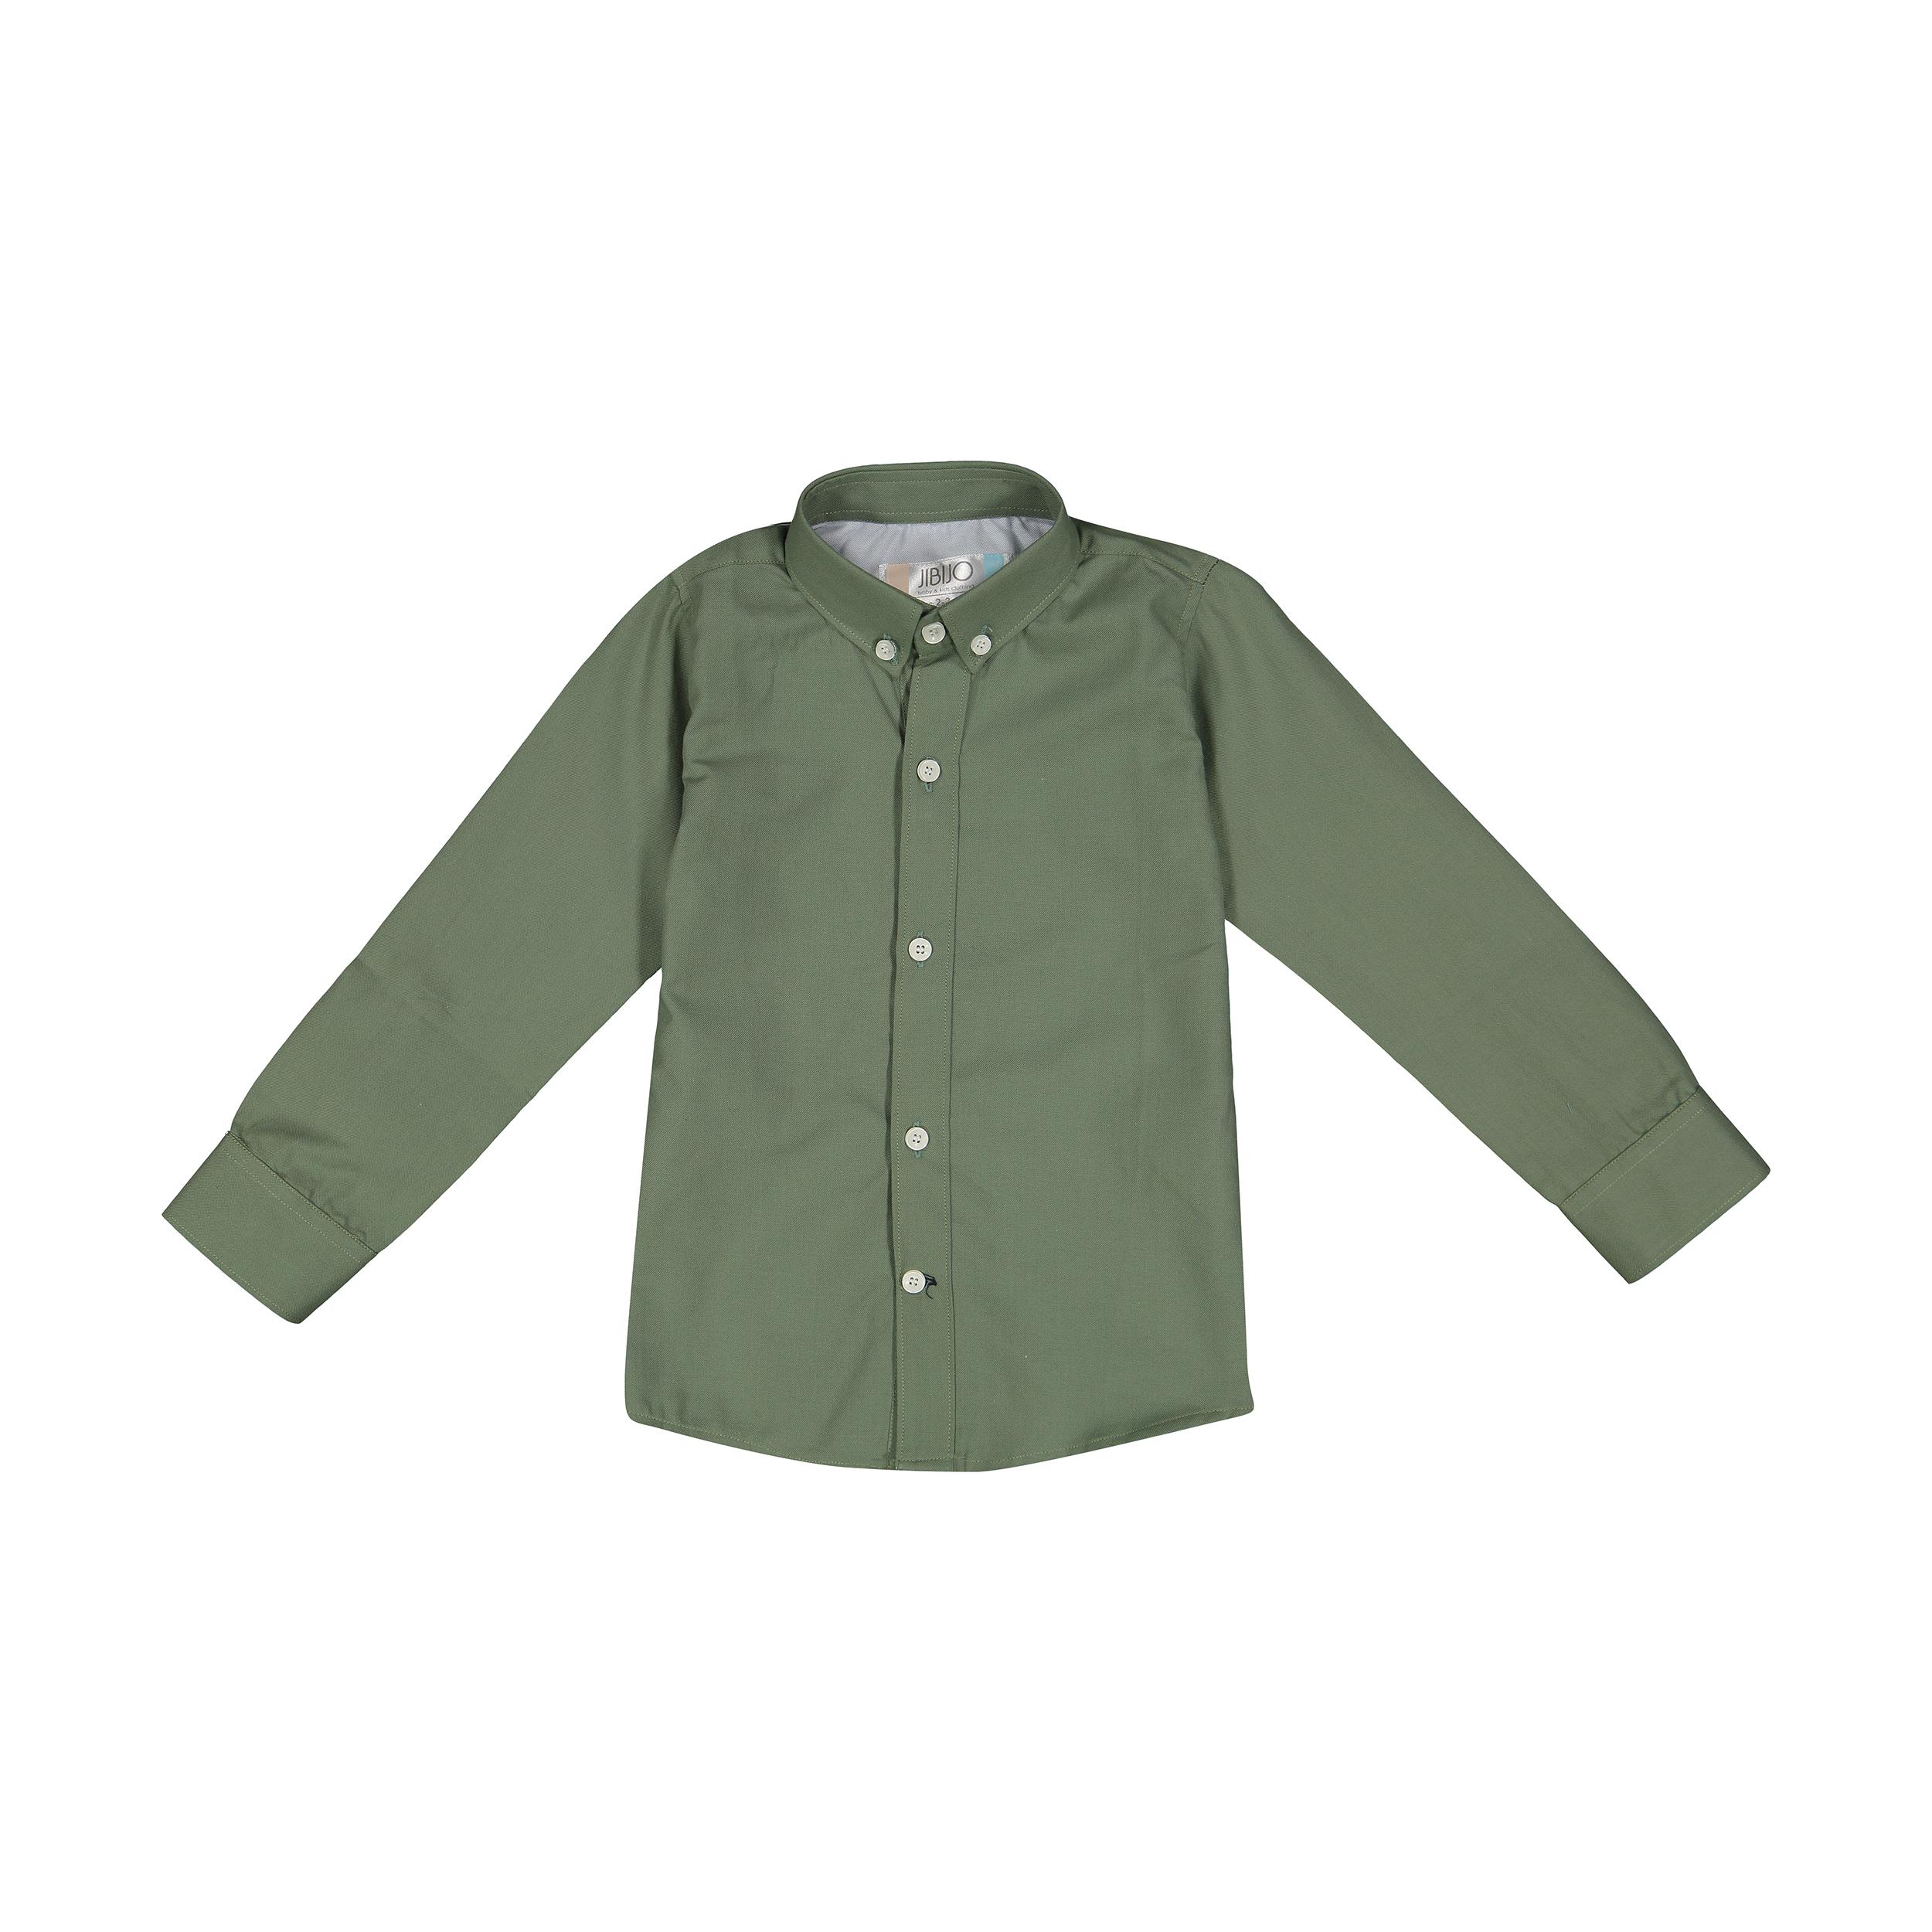 پیراهن پسرانه جیبیجو مدل 9903-5